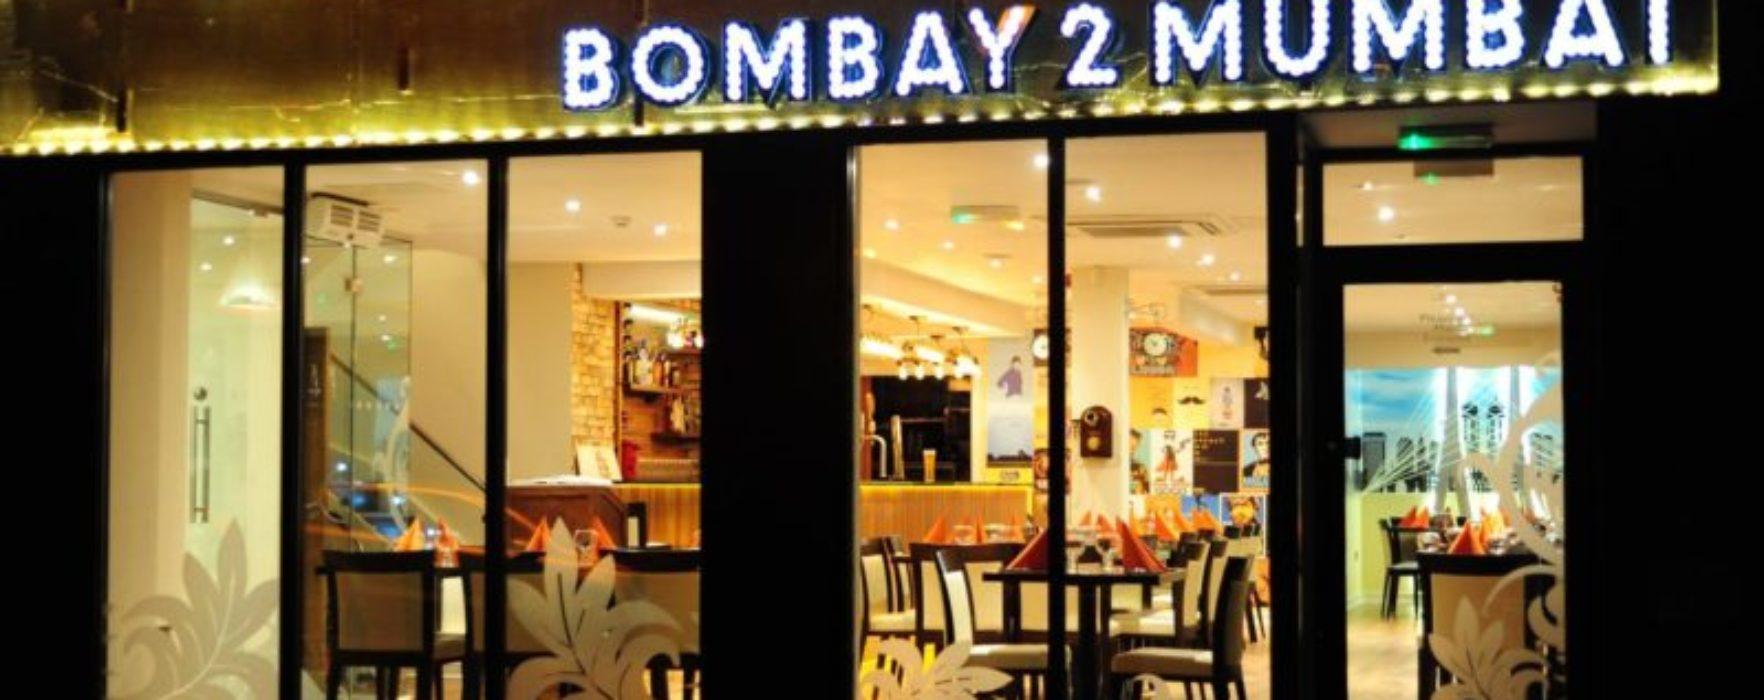 CHESHIRE: VIVA celebrates Diwali with Indian delights from Bombay to Mumbai